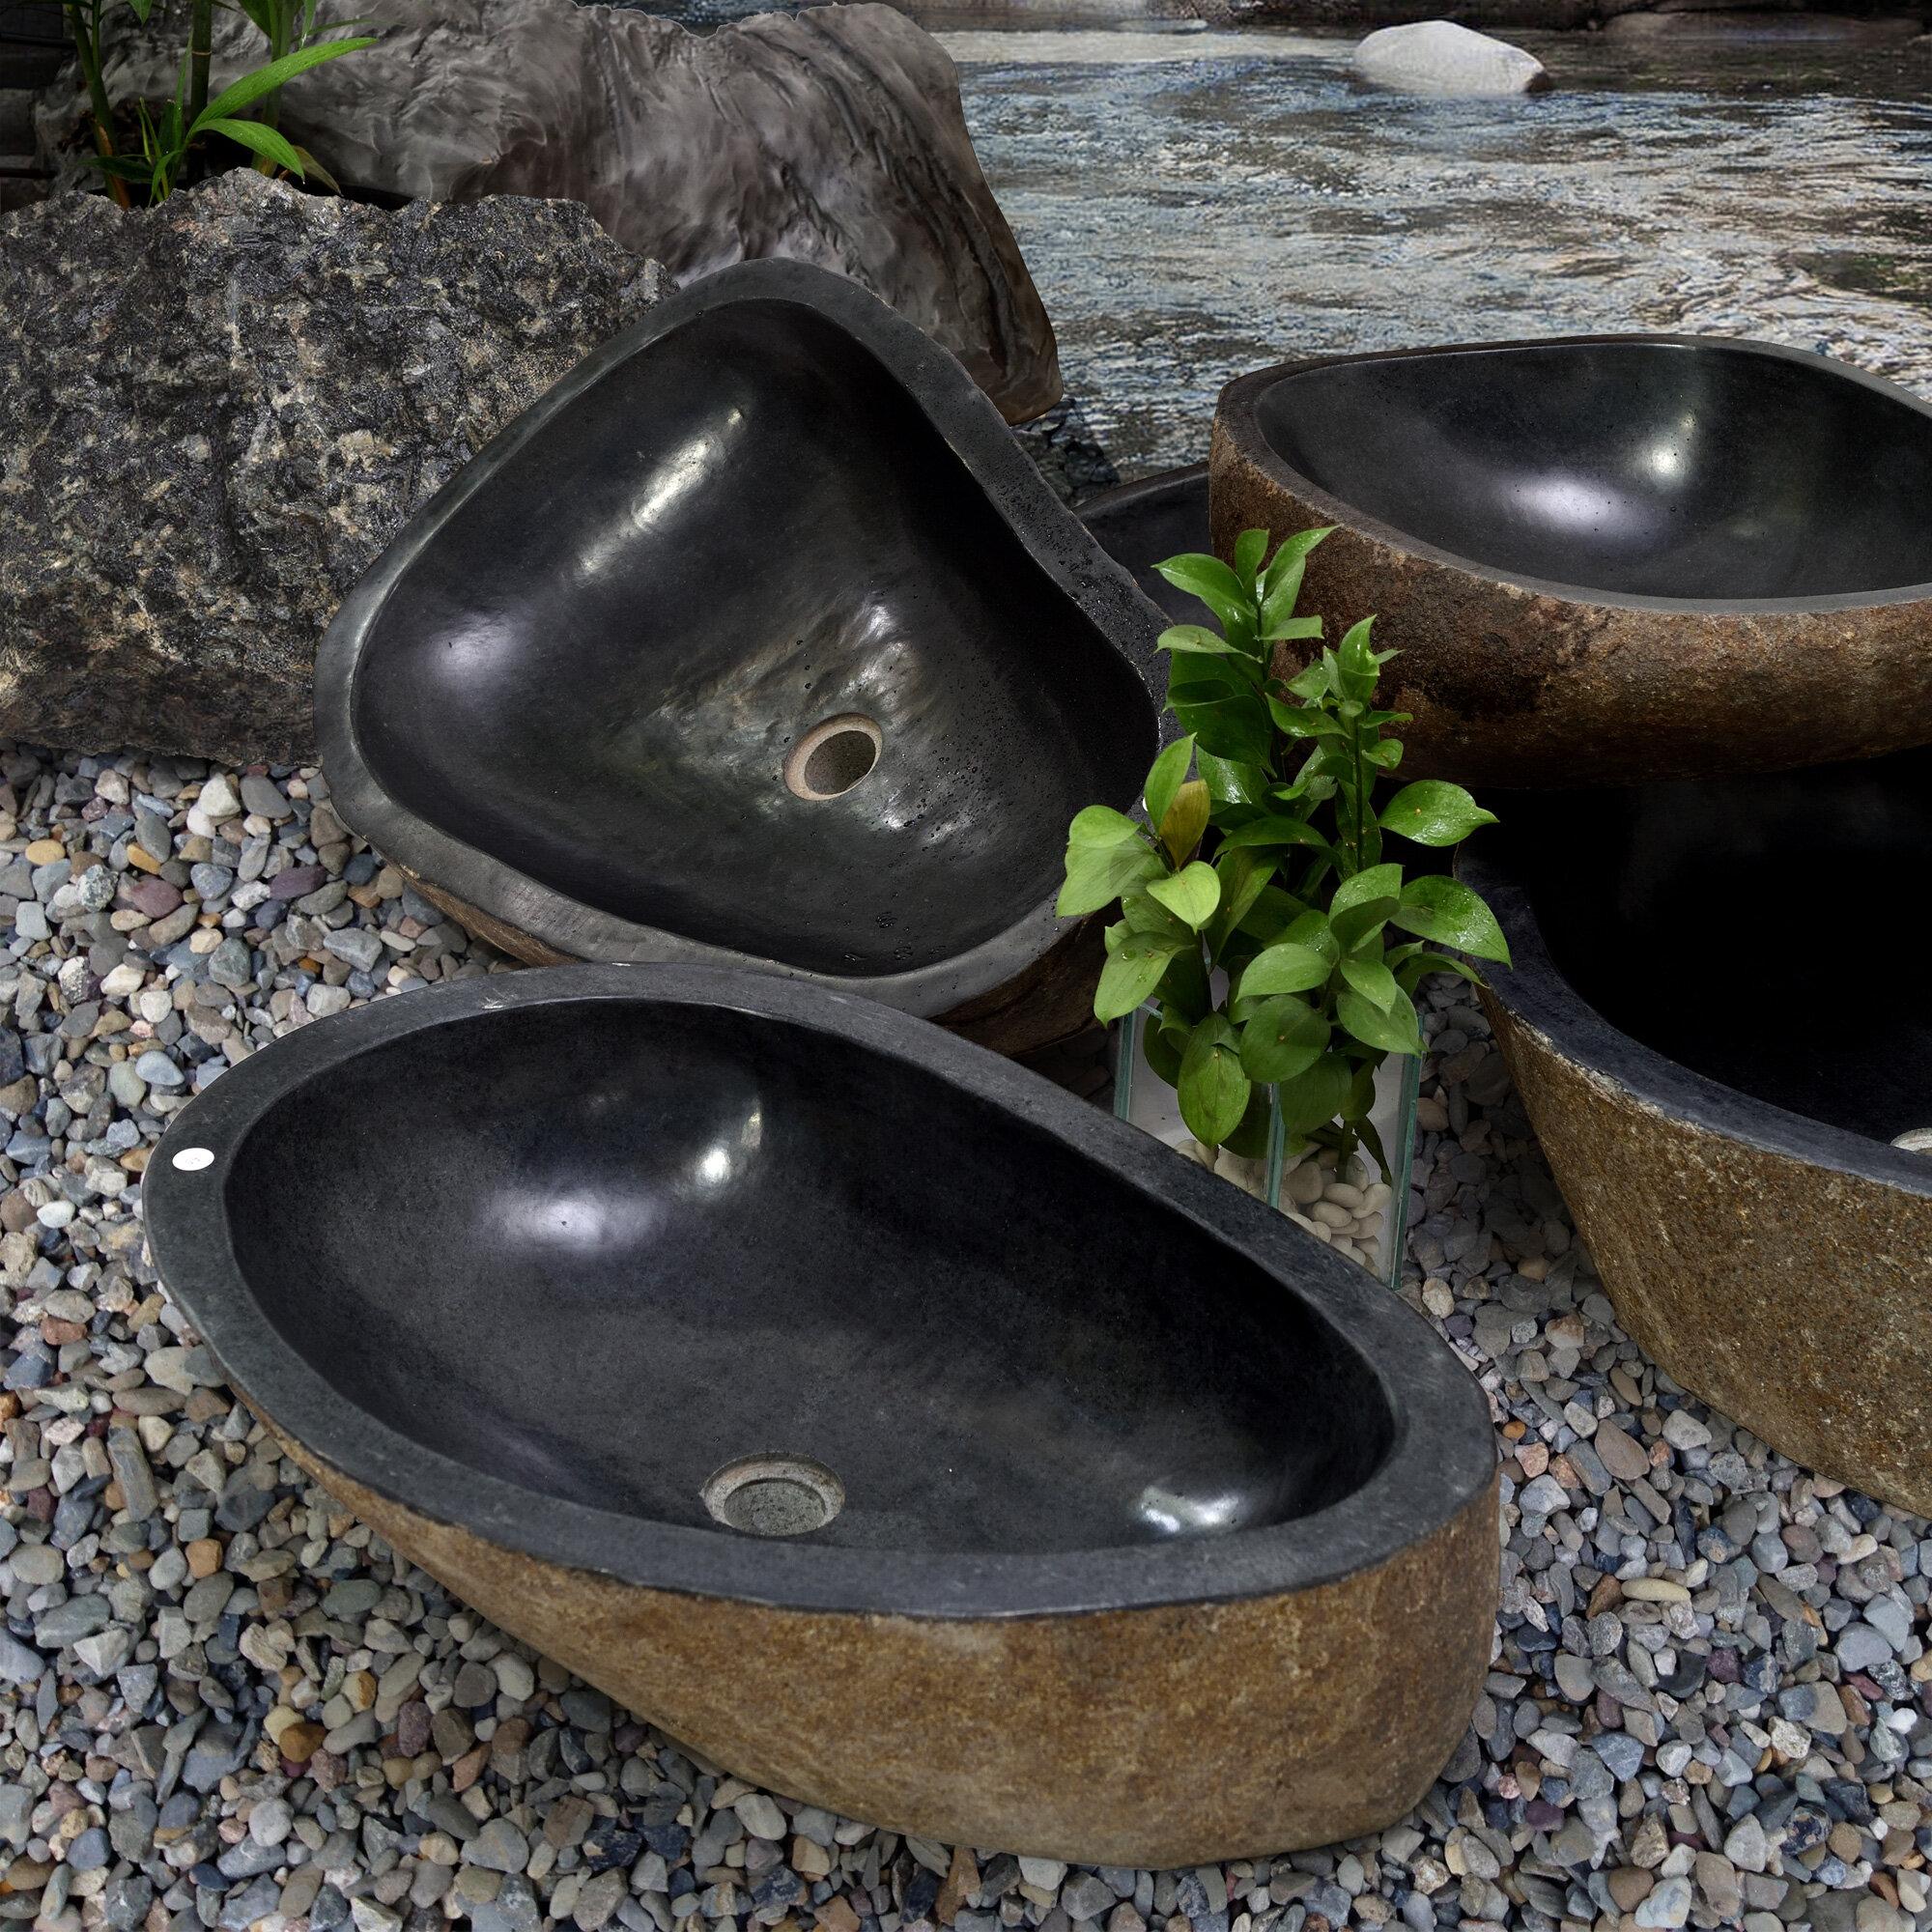 Casual Elements Specialty Vessel Bathroom Sink Stone Specialty Vessel Bathroom Sink Reviews Wayfair